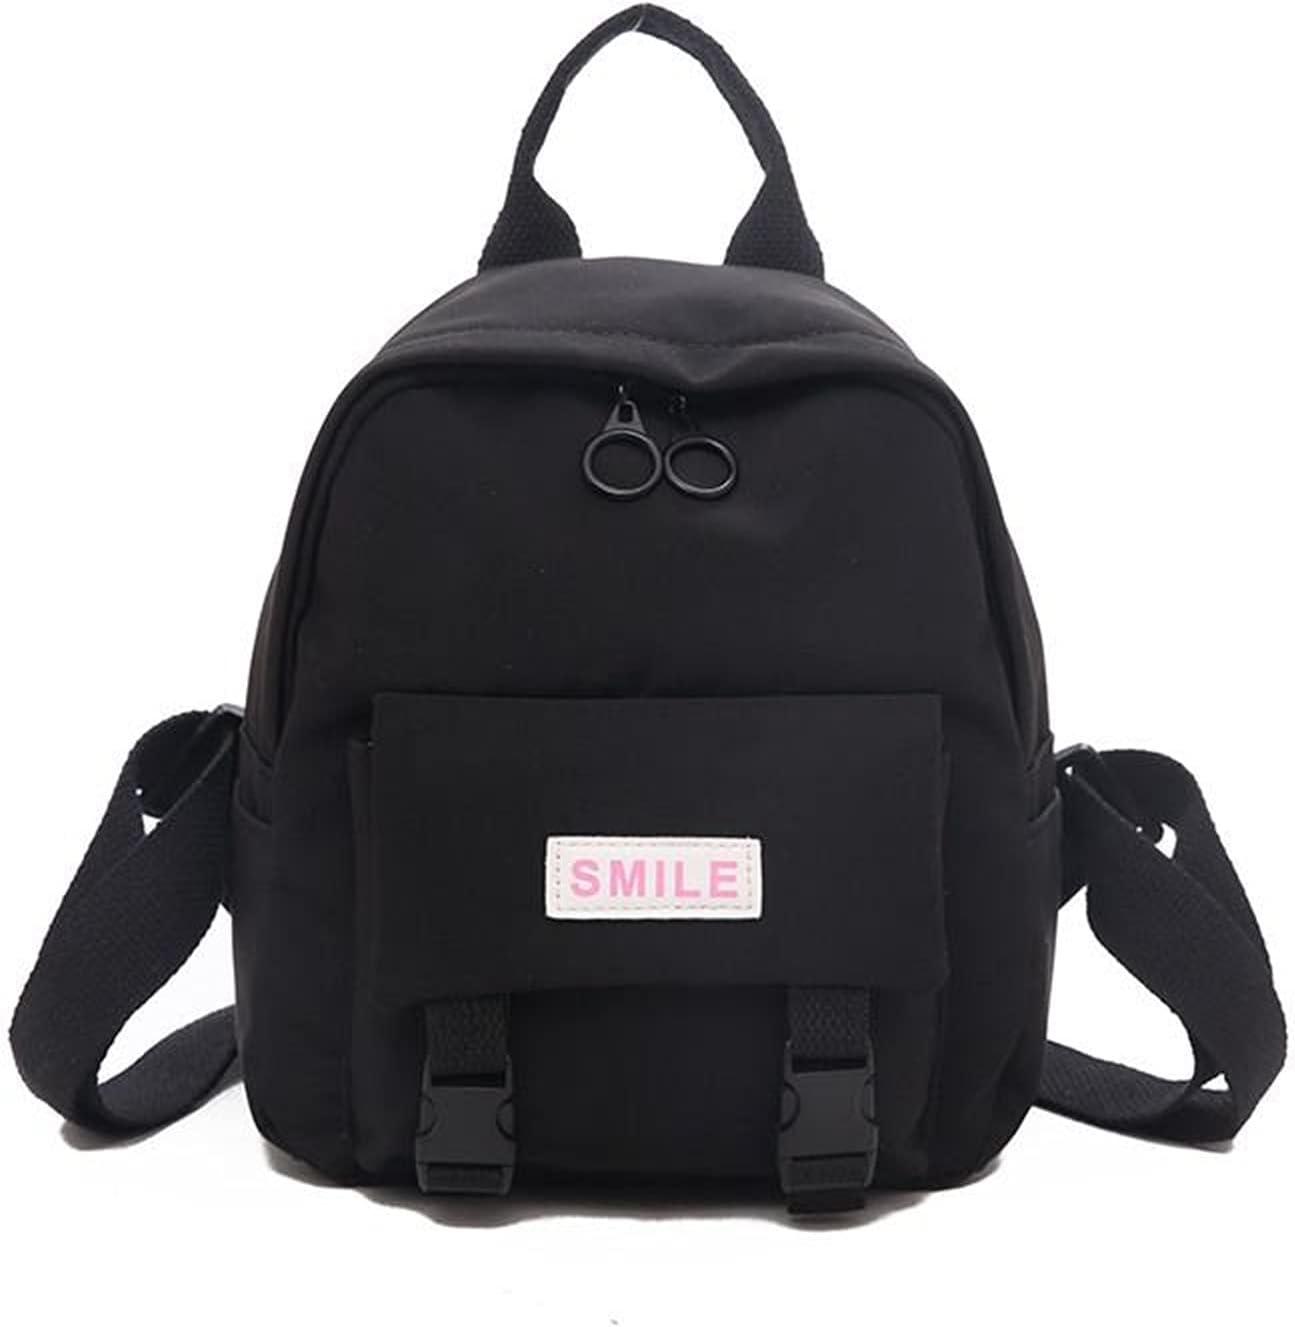 Backpacks for Girls Fashion Women Backpack New Trend Female Backpack Casual Classical Shoulder Bag Female Teen Girl School (Color : Light Green)